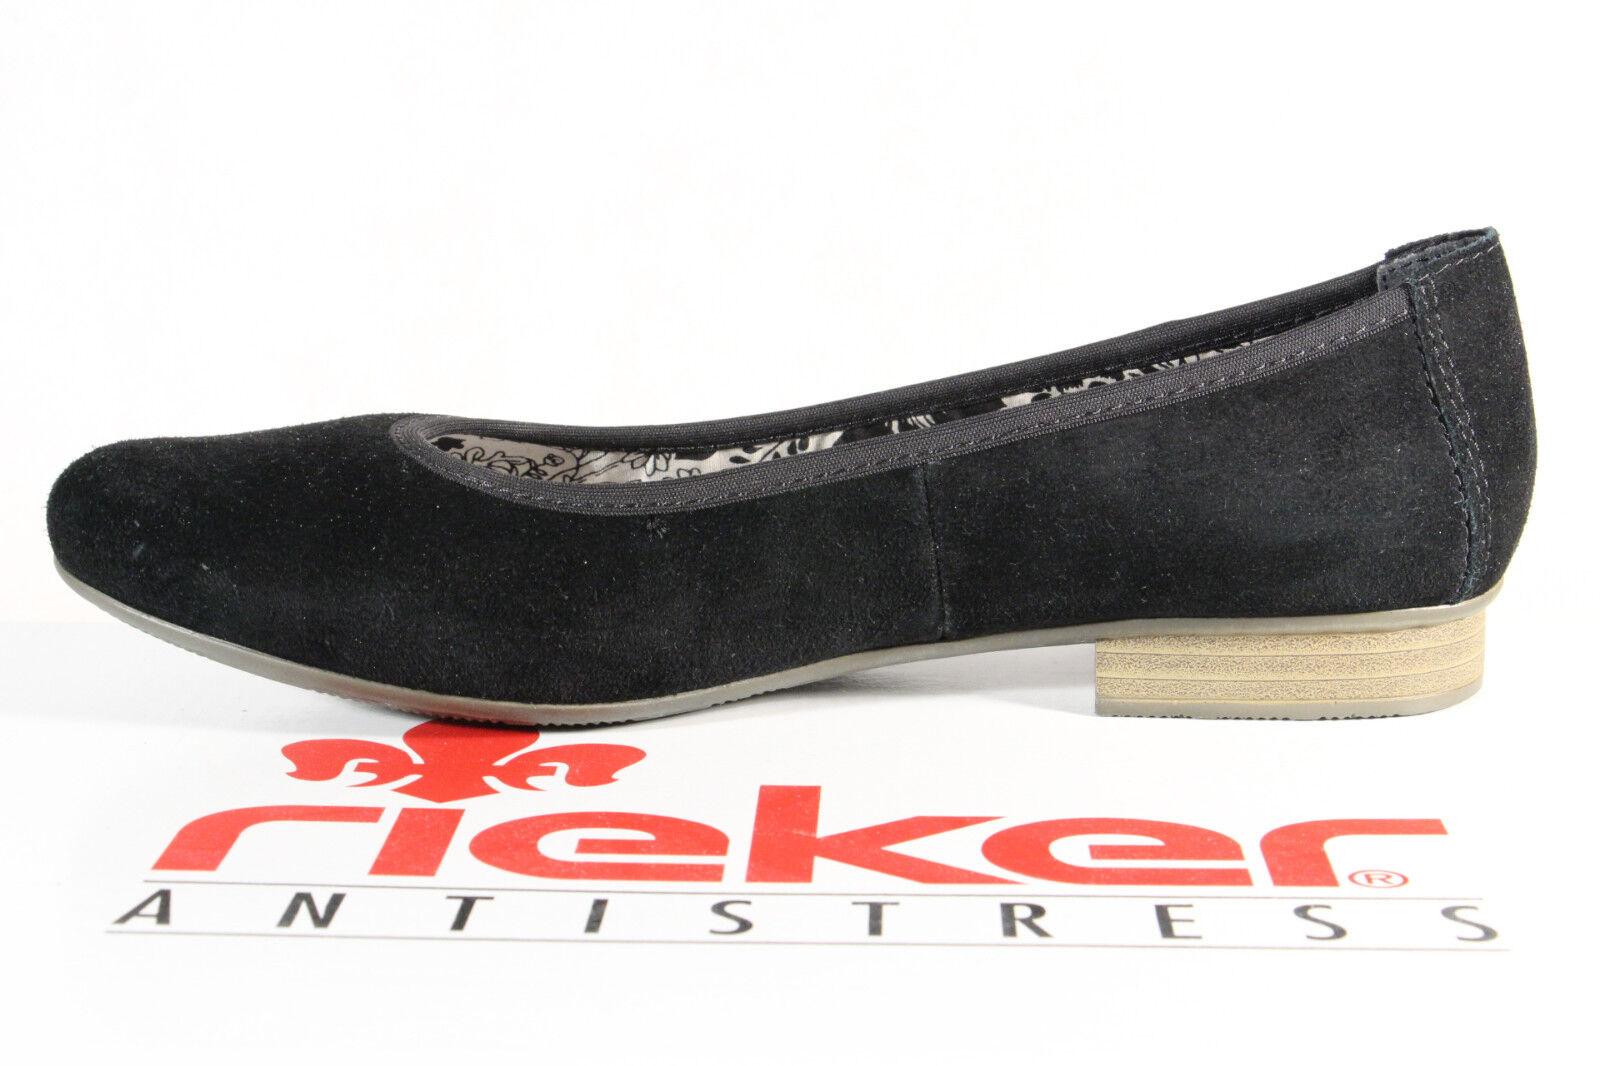 Rieker 51994 Ballerina Ballerina Ballerina Slipper Pumps schwarz Velourleder NEU  462626